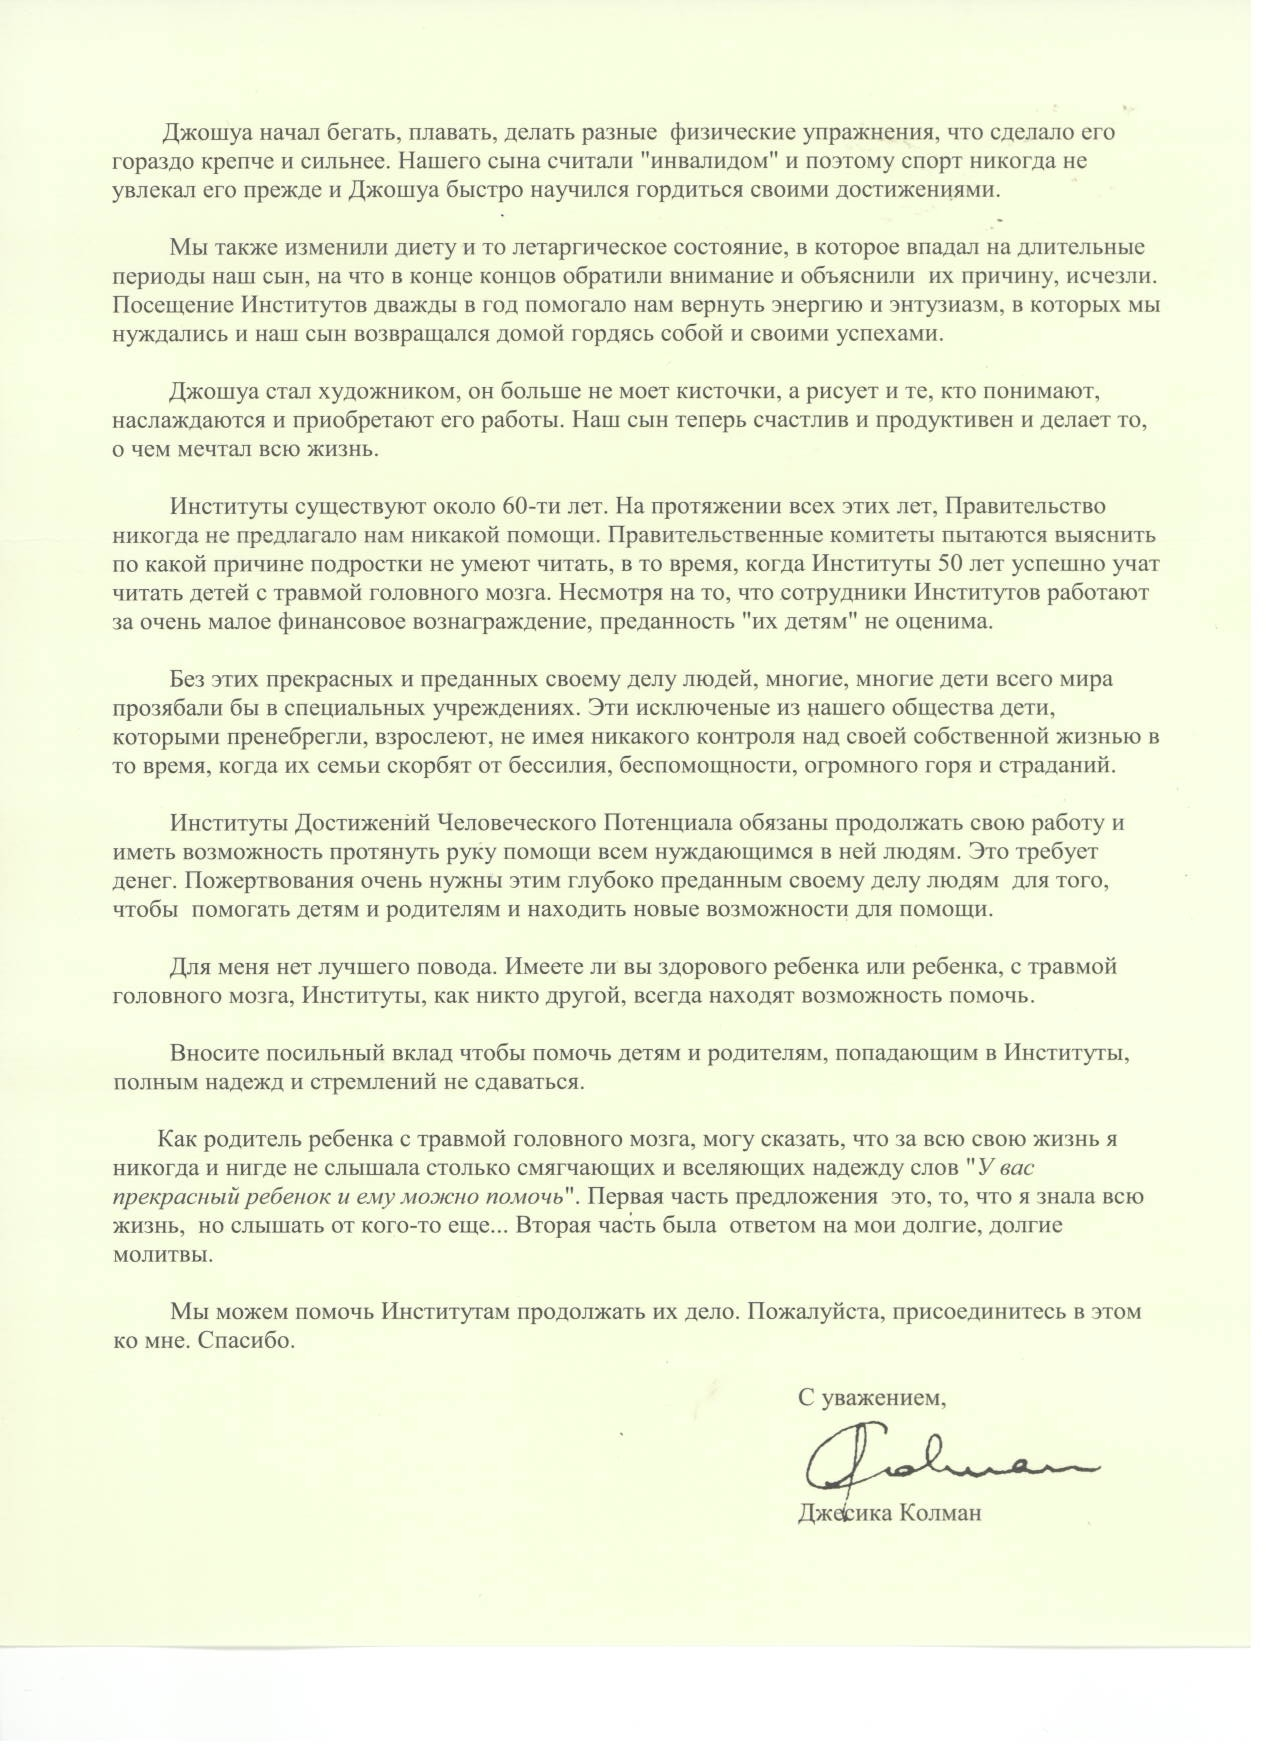 Письмо Джесики Колман (2 страница)